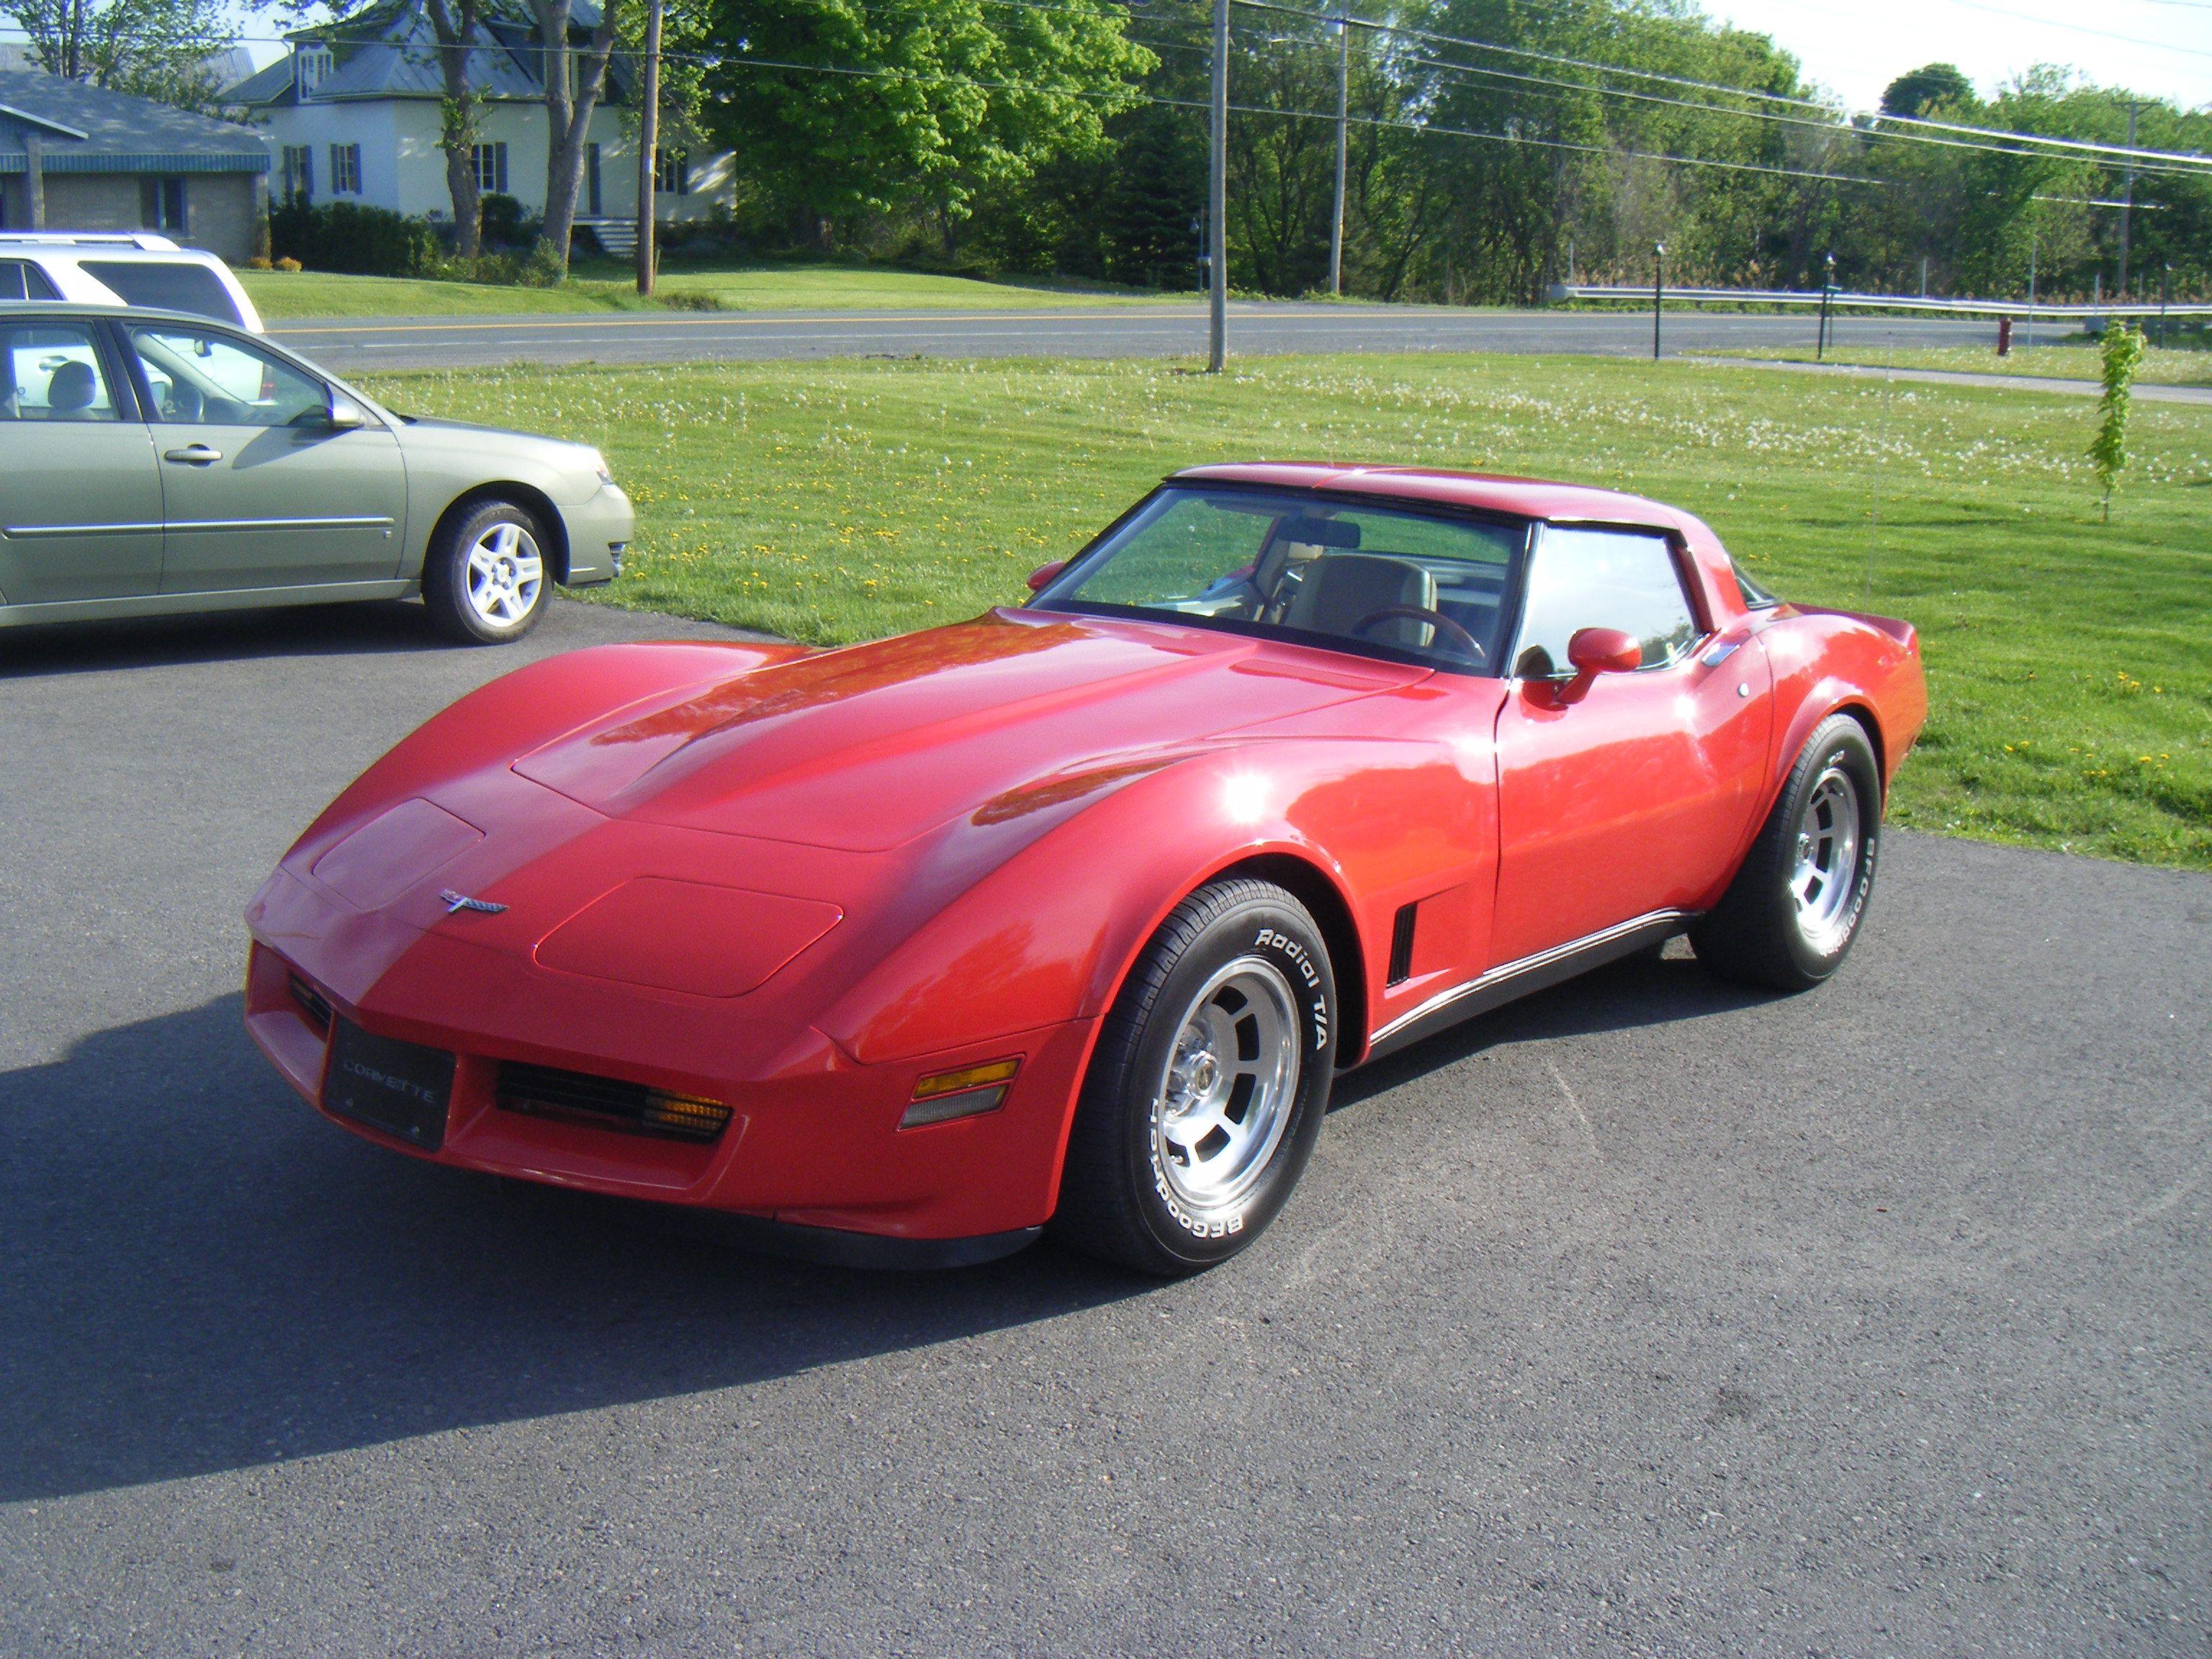 1980 Corvette Maintenance/restoration of old/vintage vehicles: the